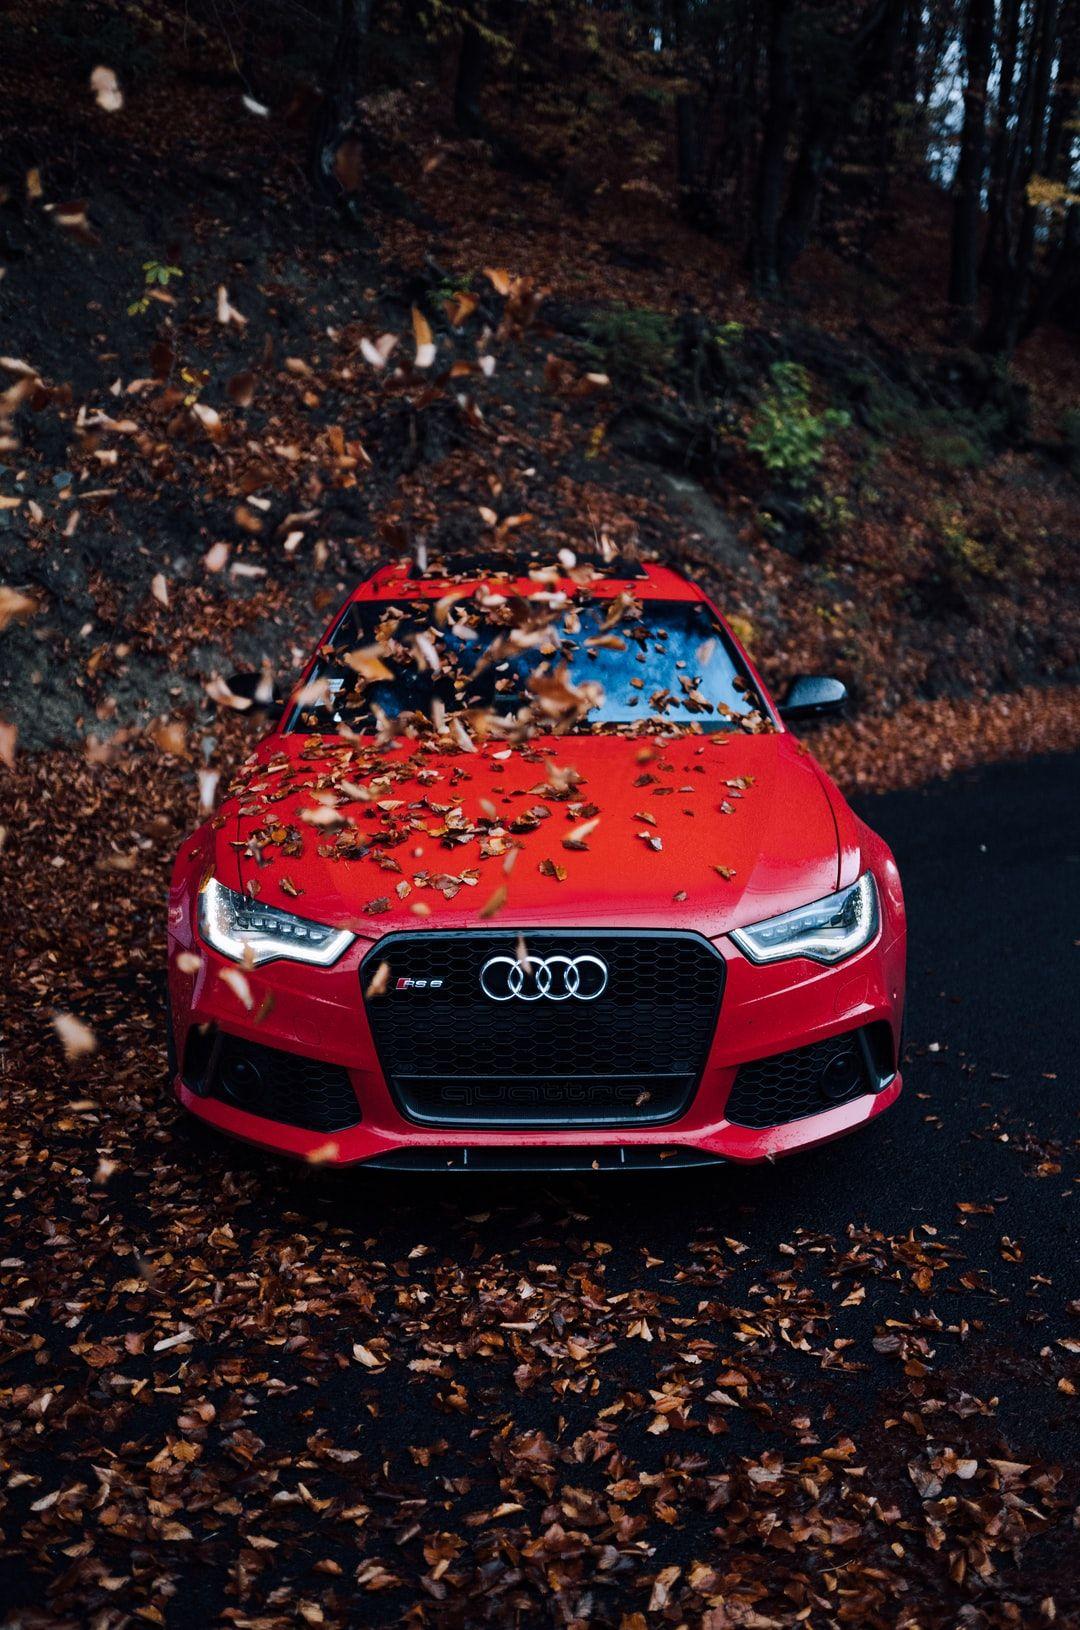 Download This Photo By Daniel Minarik On Unsplash Audi Cars Red Audi Car Wallpapers Download audi black car wallpaper